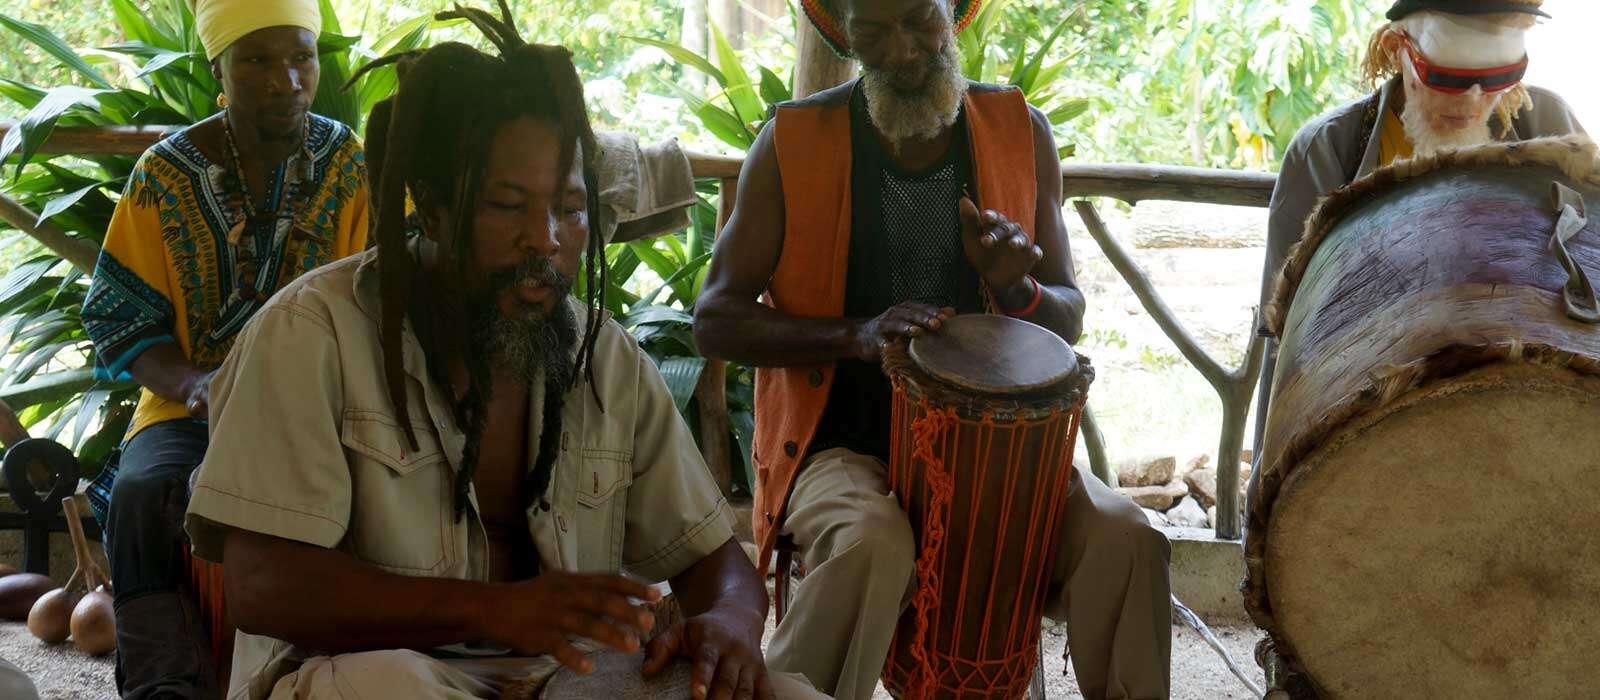 Explore the Rastafarian Village